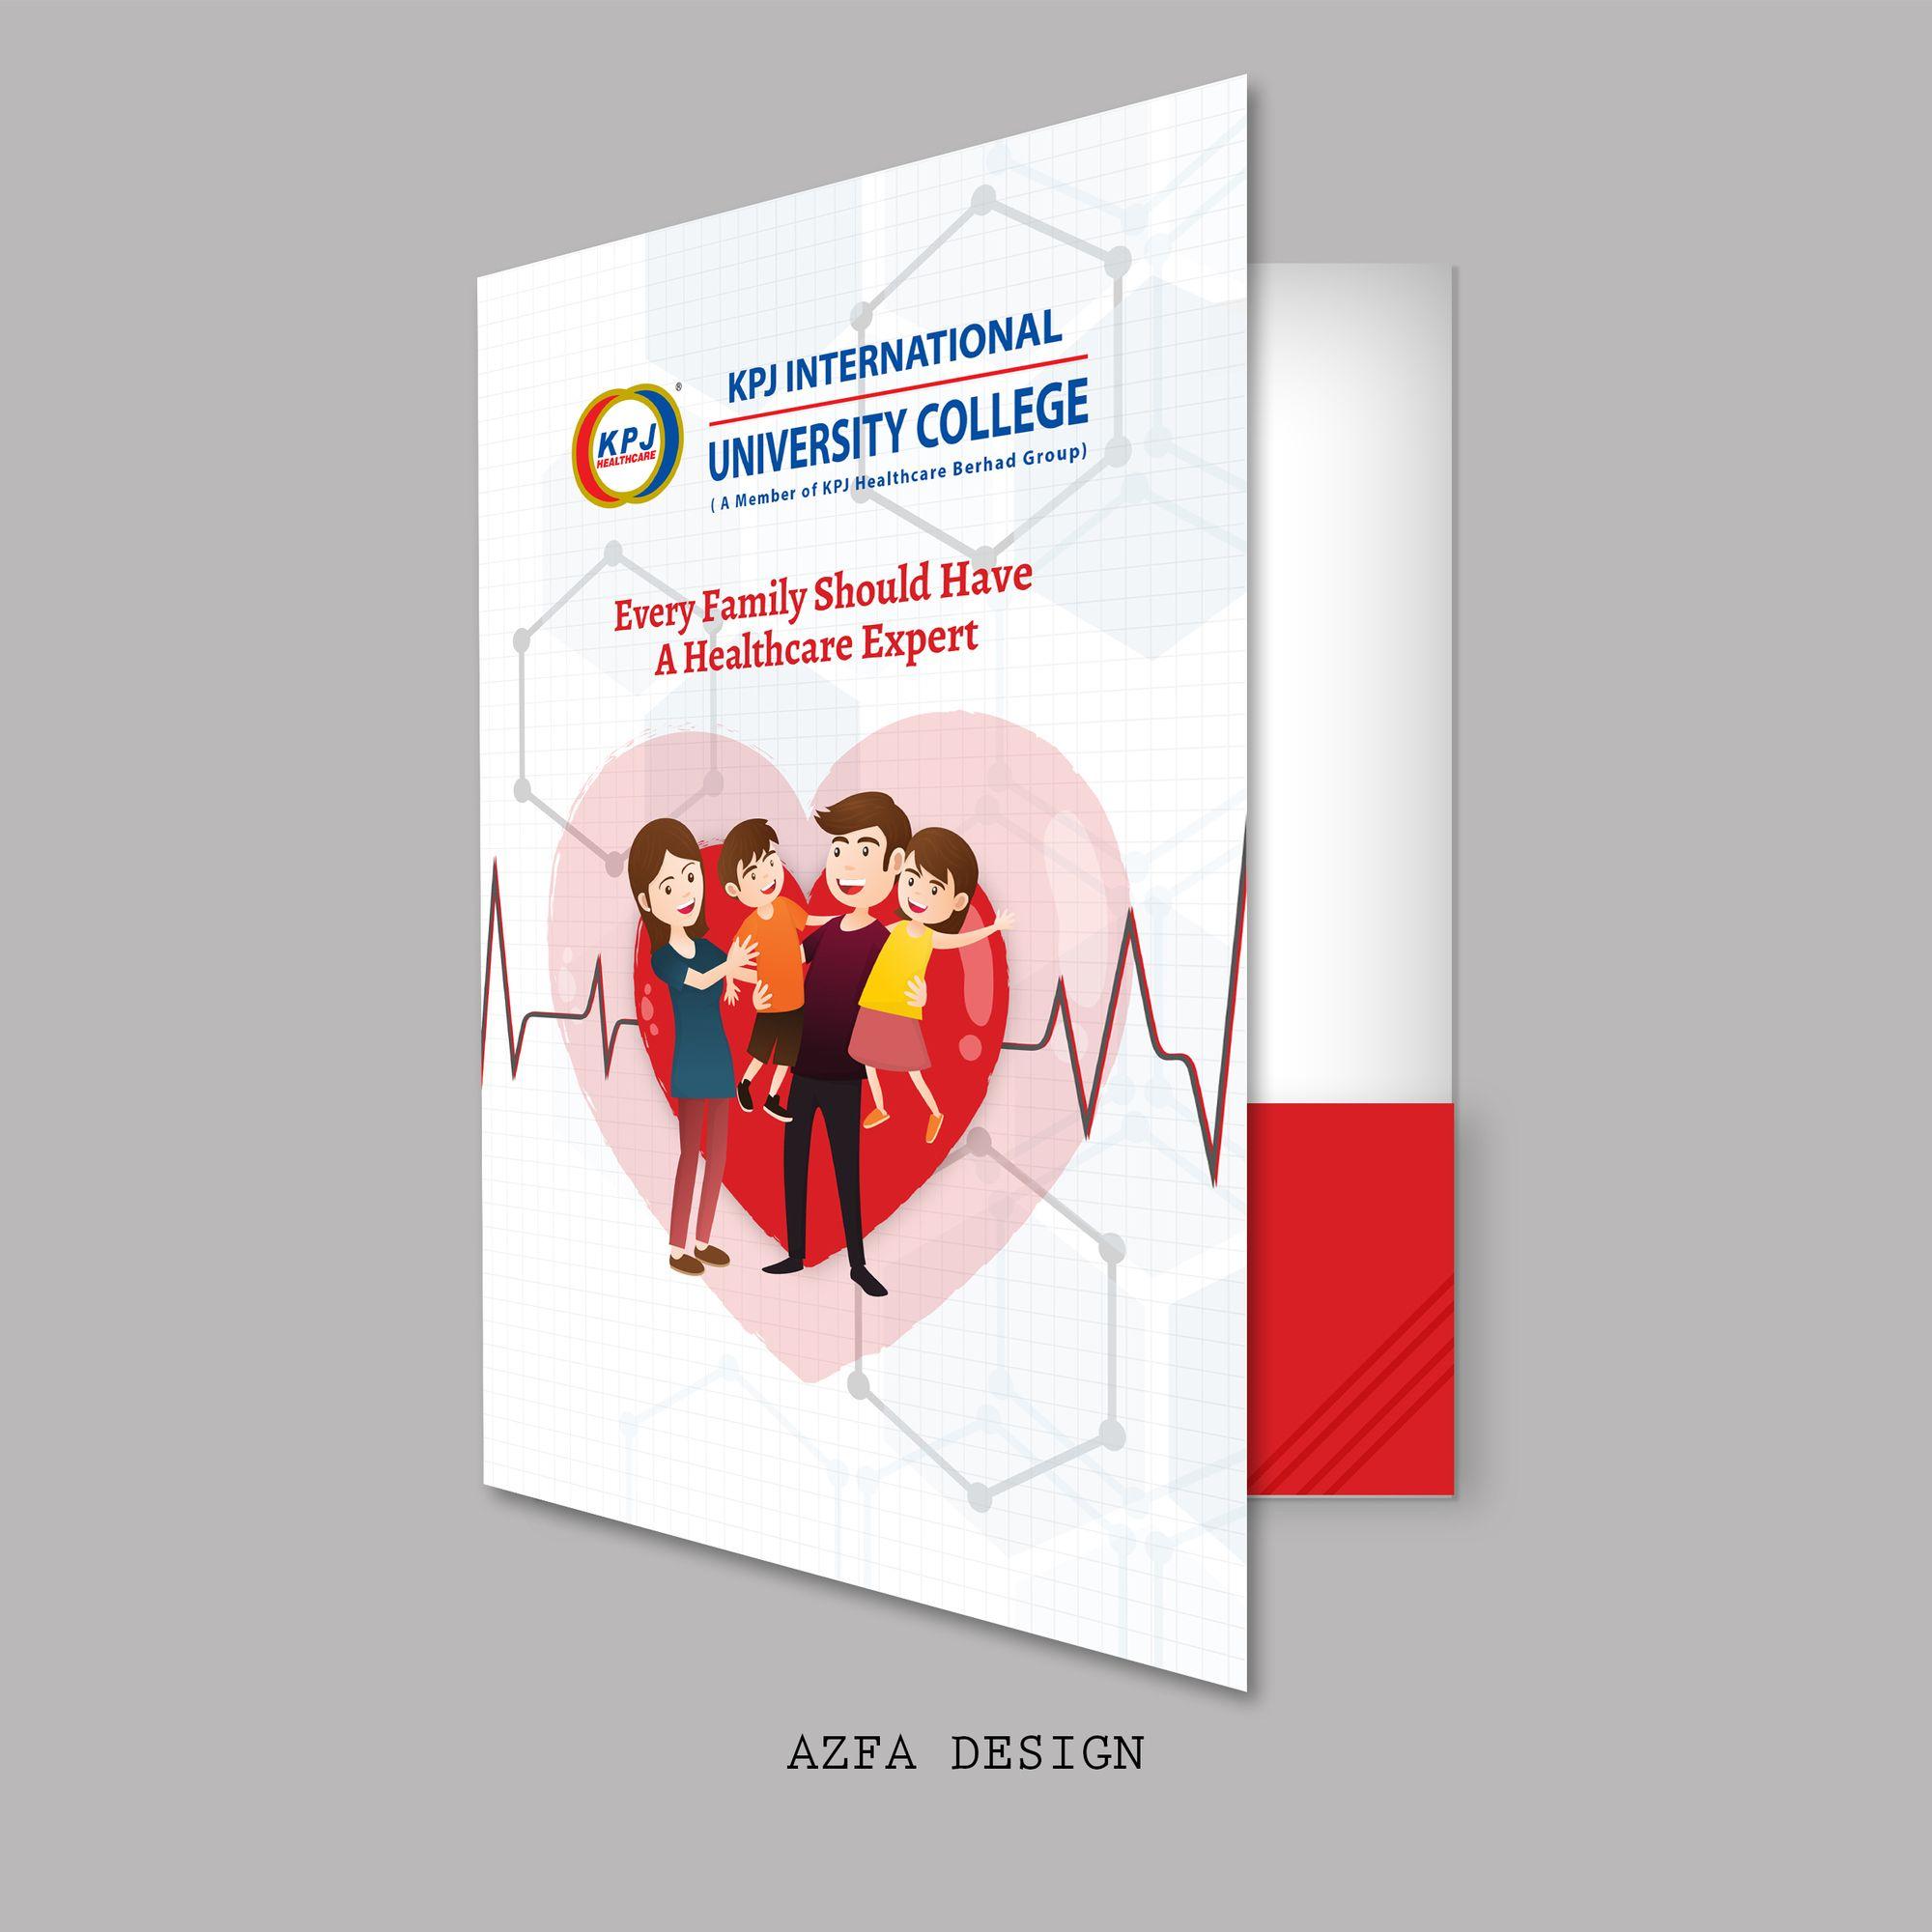 Azfadesign Filekorporat Design Corporate File Kami Boleh Designkan File Korporat Yang Colleges And Universities Book Cover Supportive